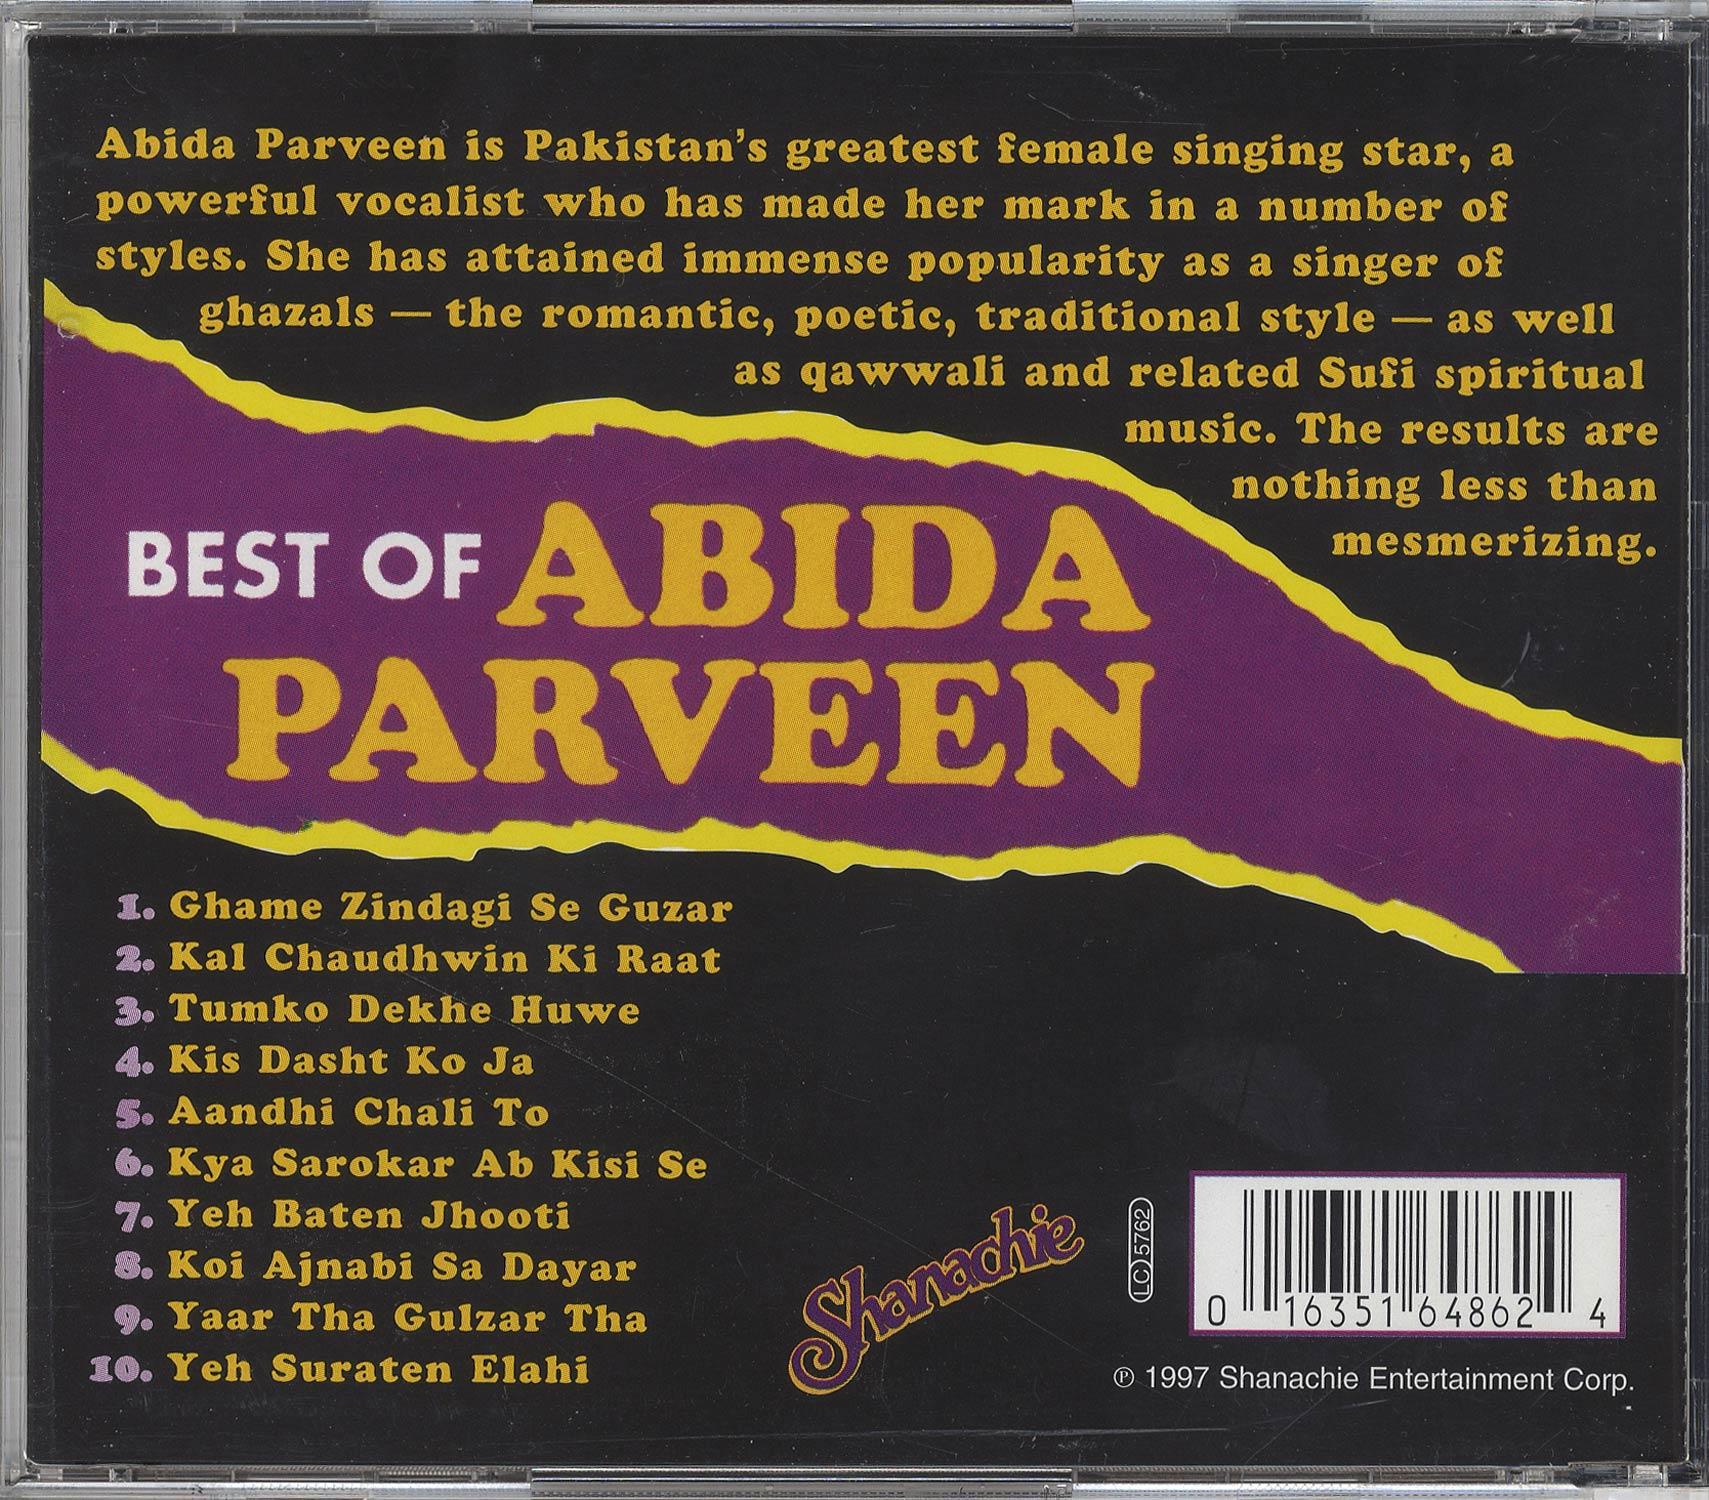 The Best of Abida Parveen[image2]